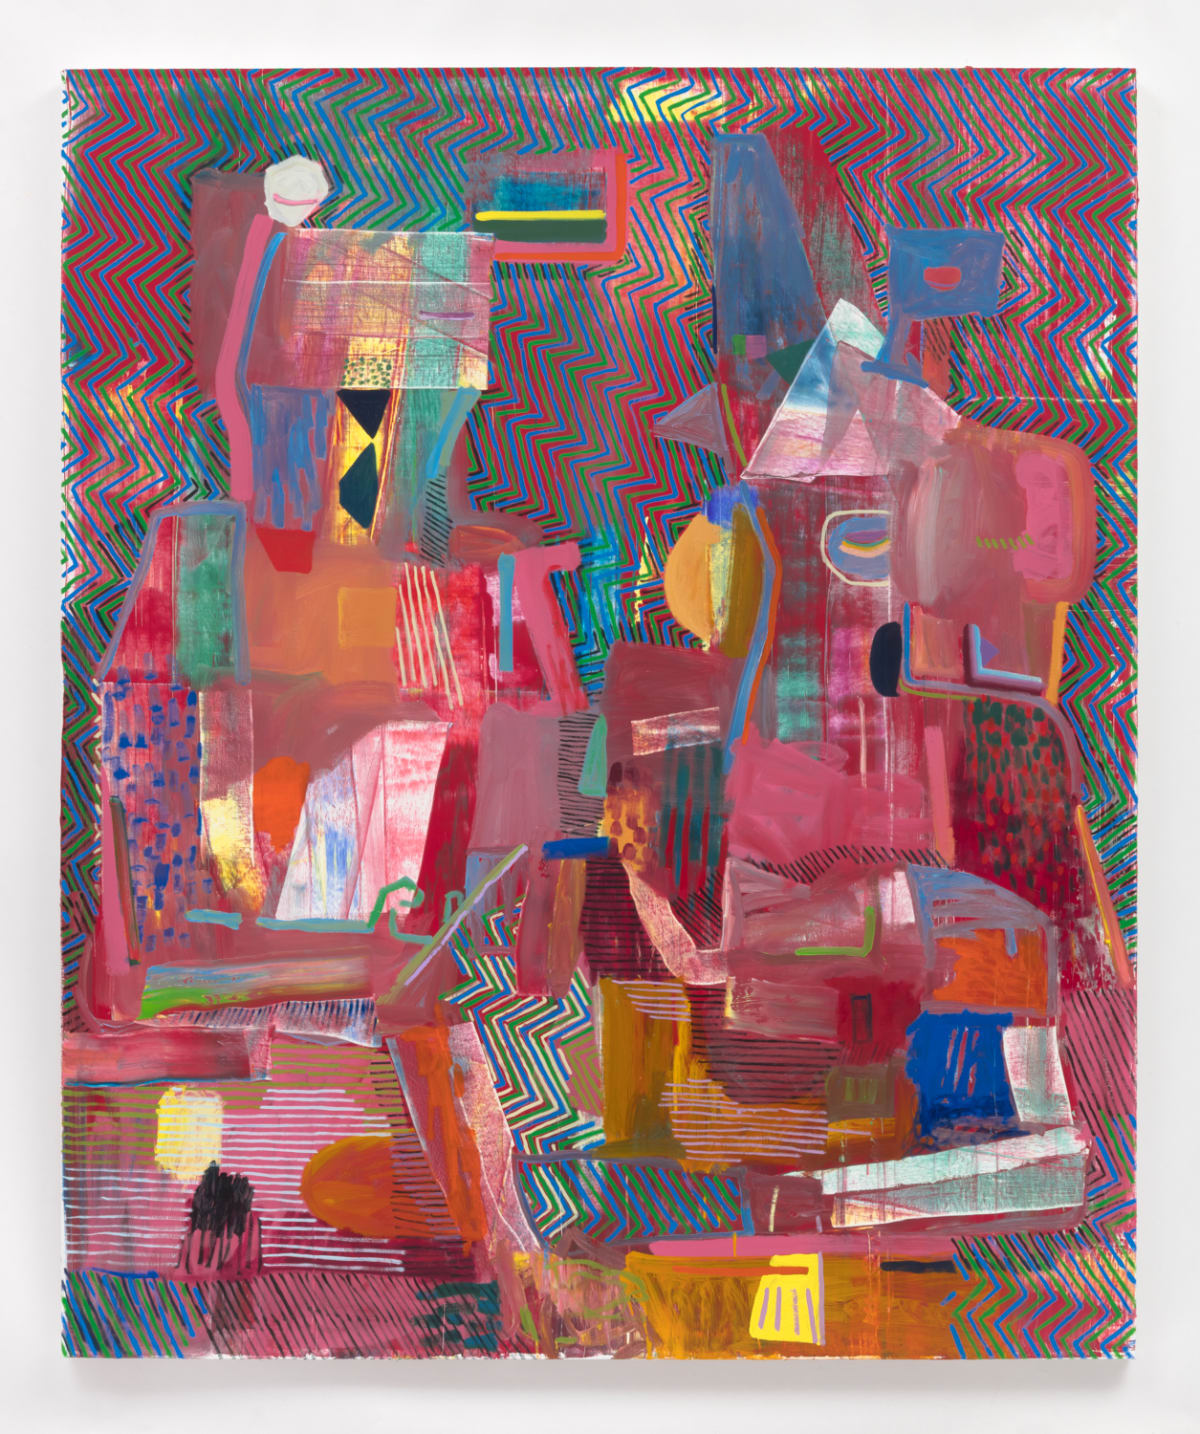 Tomory Dodge, House of Sleeping Robots, 2019